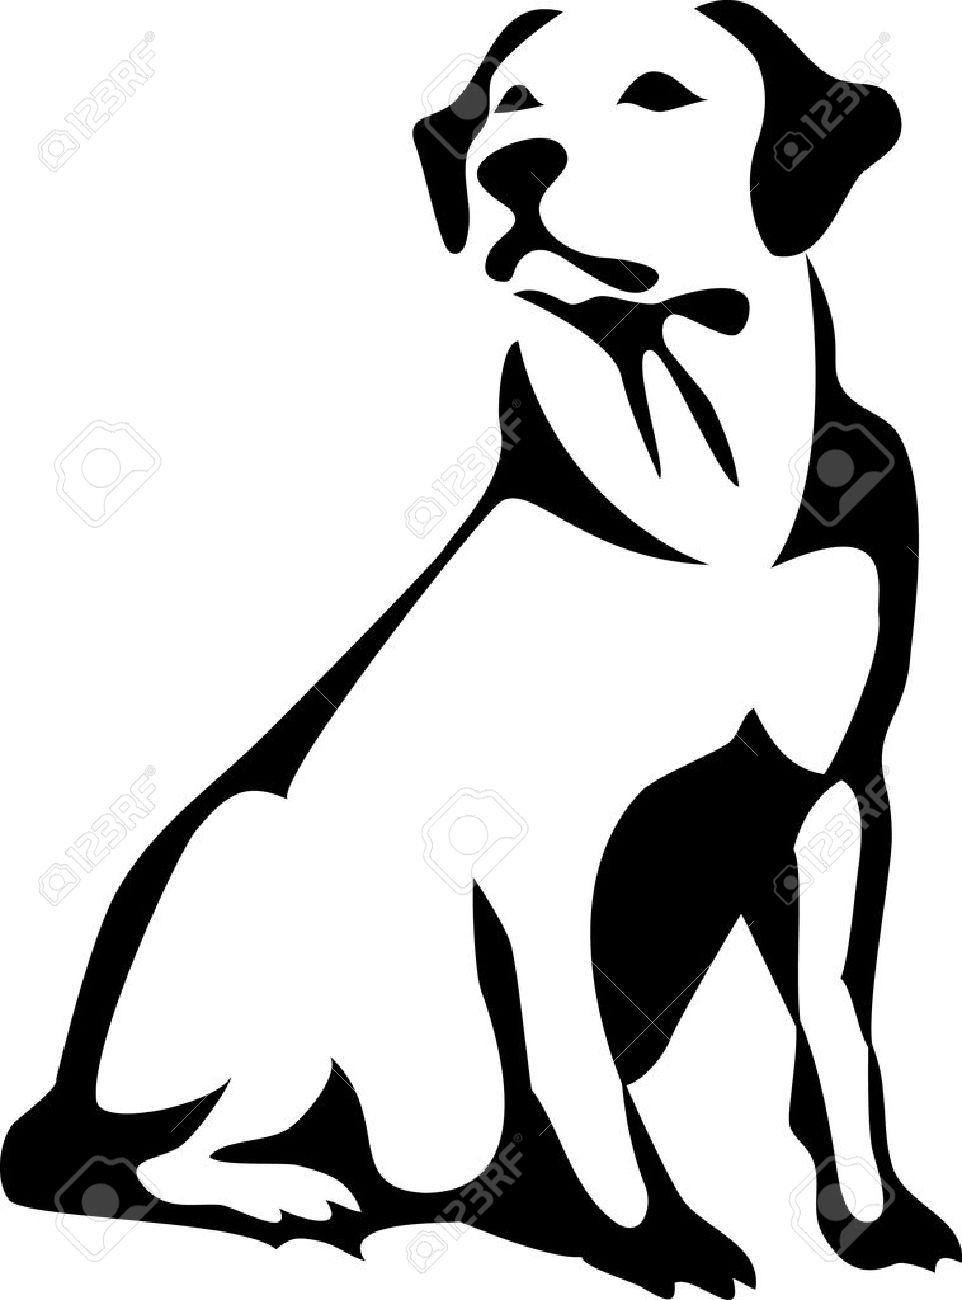 Labrador retriever clipart black white free image black and white download Lab Dog Clipart | Free download best Lab Dog Clipart on ... image black and white download